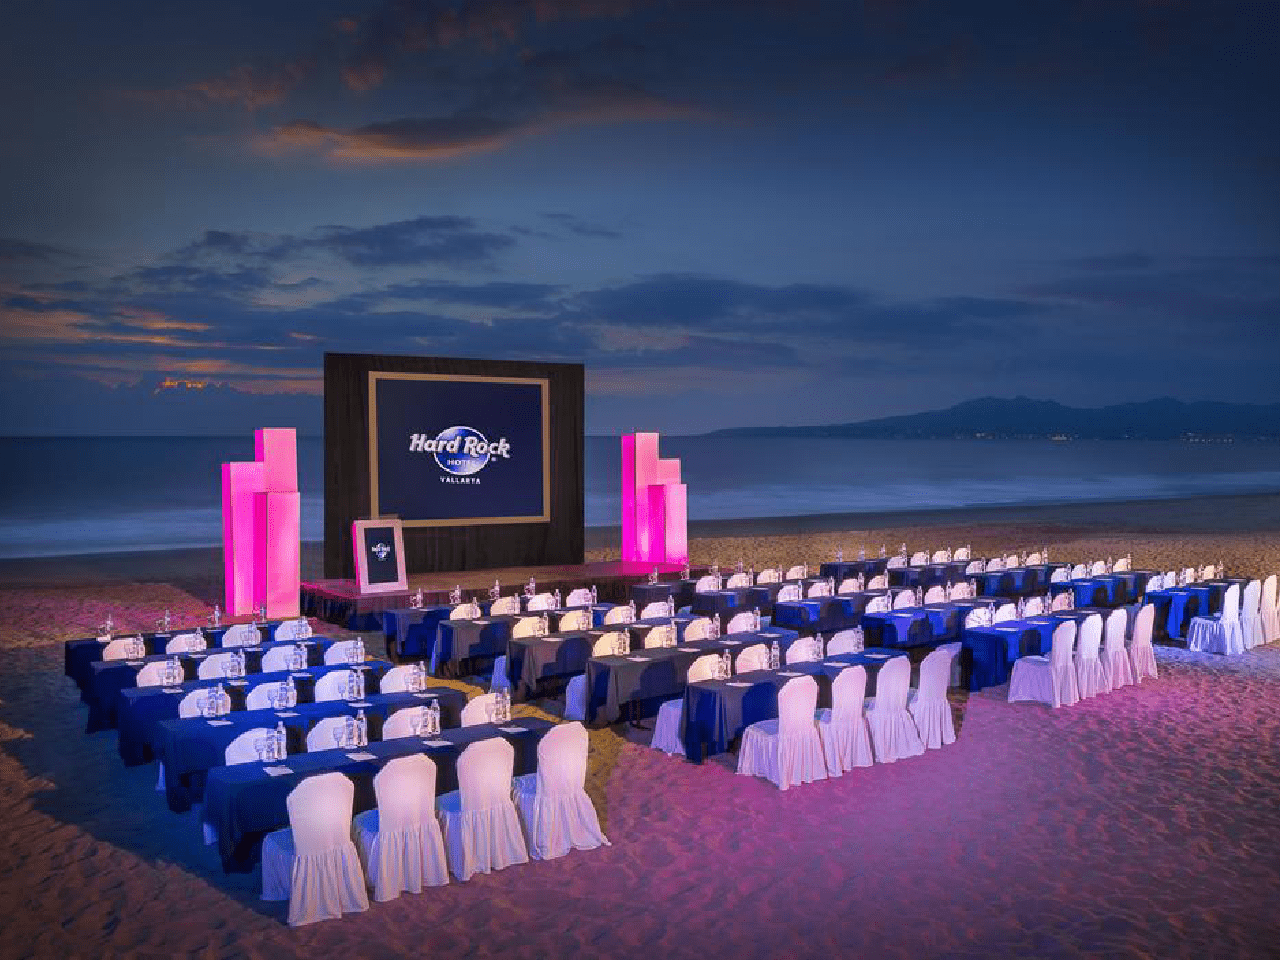 Bodas en la playa - panatalla - show - boda